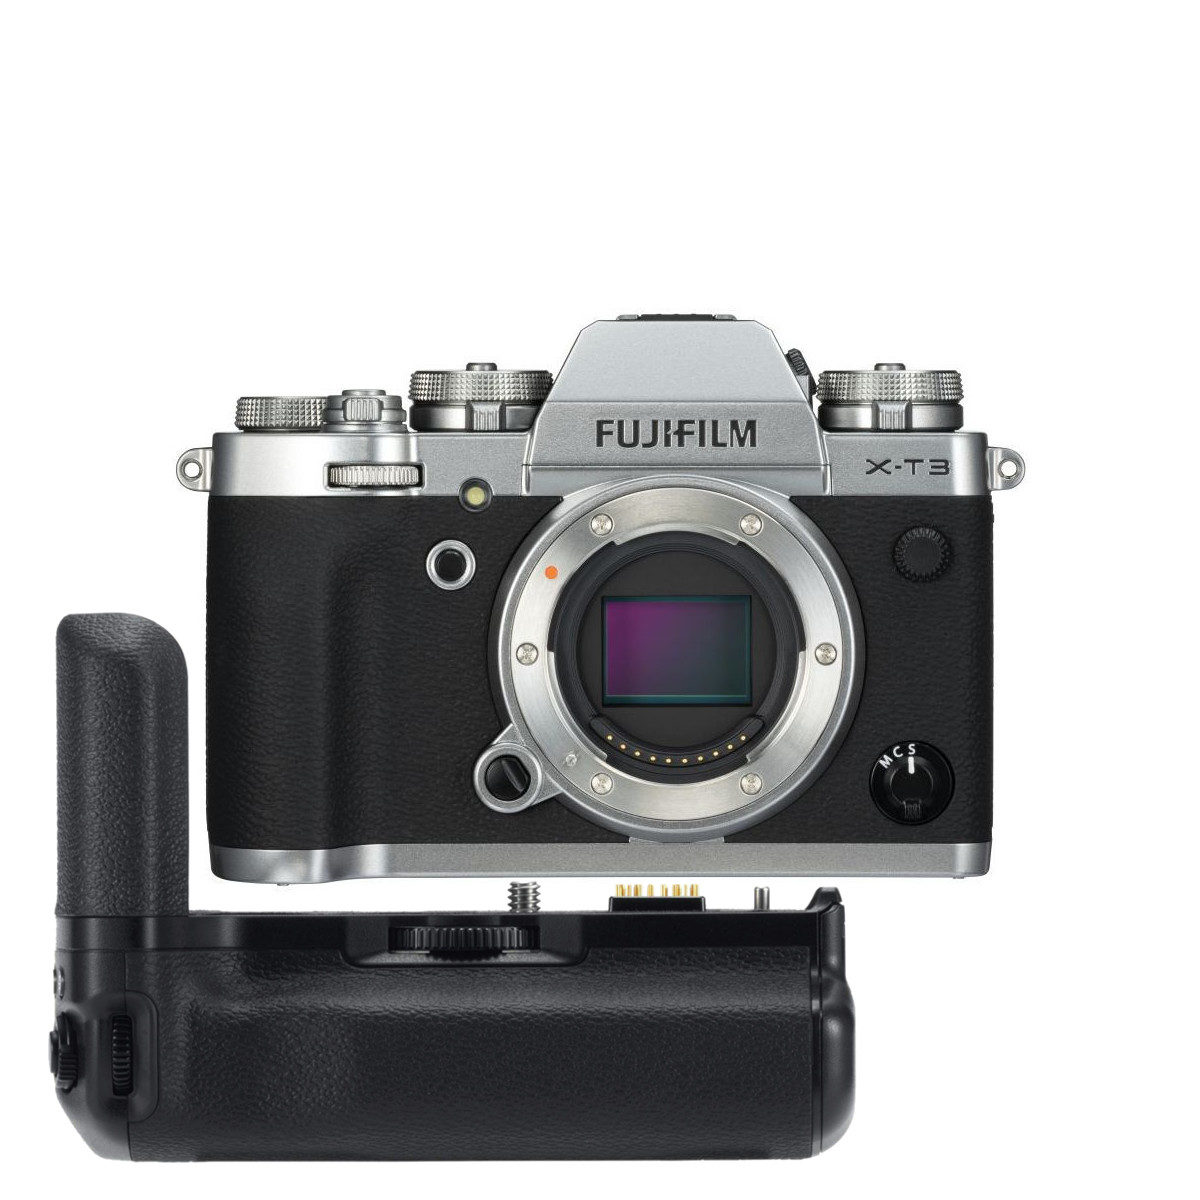 Fujifilm X-T3 systeemcamera Zilver + VG-XT3 Battery Grip <br/>€ 1719.00 <br/> <a href='https://www.cameranu.nl/fotografie/?tt=12190_474631_241358_&r=https%3A%2F%2Fwww.cameranu.nl%2Fnl%2Fp2692965%2Ffujifilm-x-t3-systeemcamera-zilver-vg-xt3-battery-grip%3Fchannable%3De10841.MjY5Mjk2NQ%26utm_campaign%3D%26utm_content%3DSysteemcamera%26utm_source%3DTradetracker%26utm_medium%3Dcpc%26utm_term%3DDigitale%2Bcamera%26apos%3Bs' target='_blank'>naar de winkel</a>